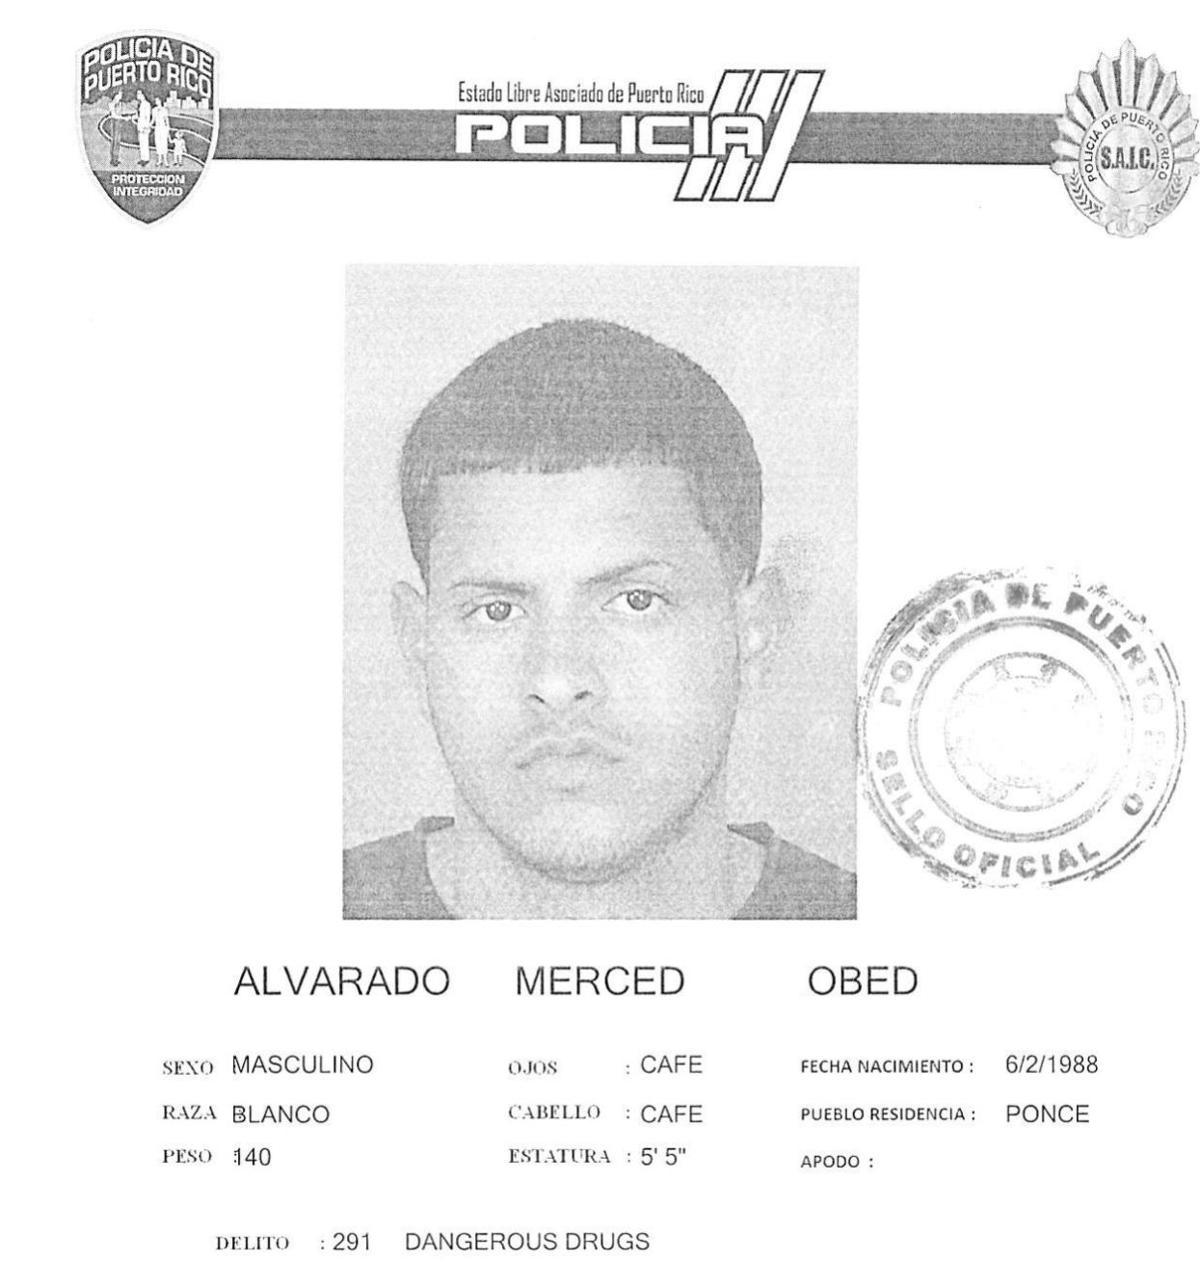 Ficha Obed Alvarado Merced